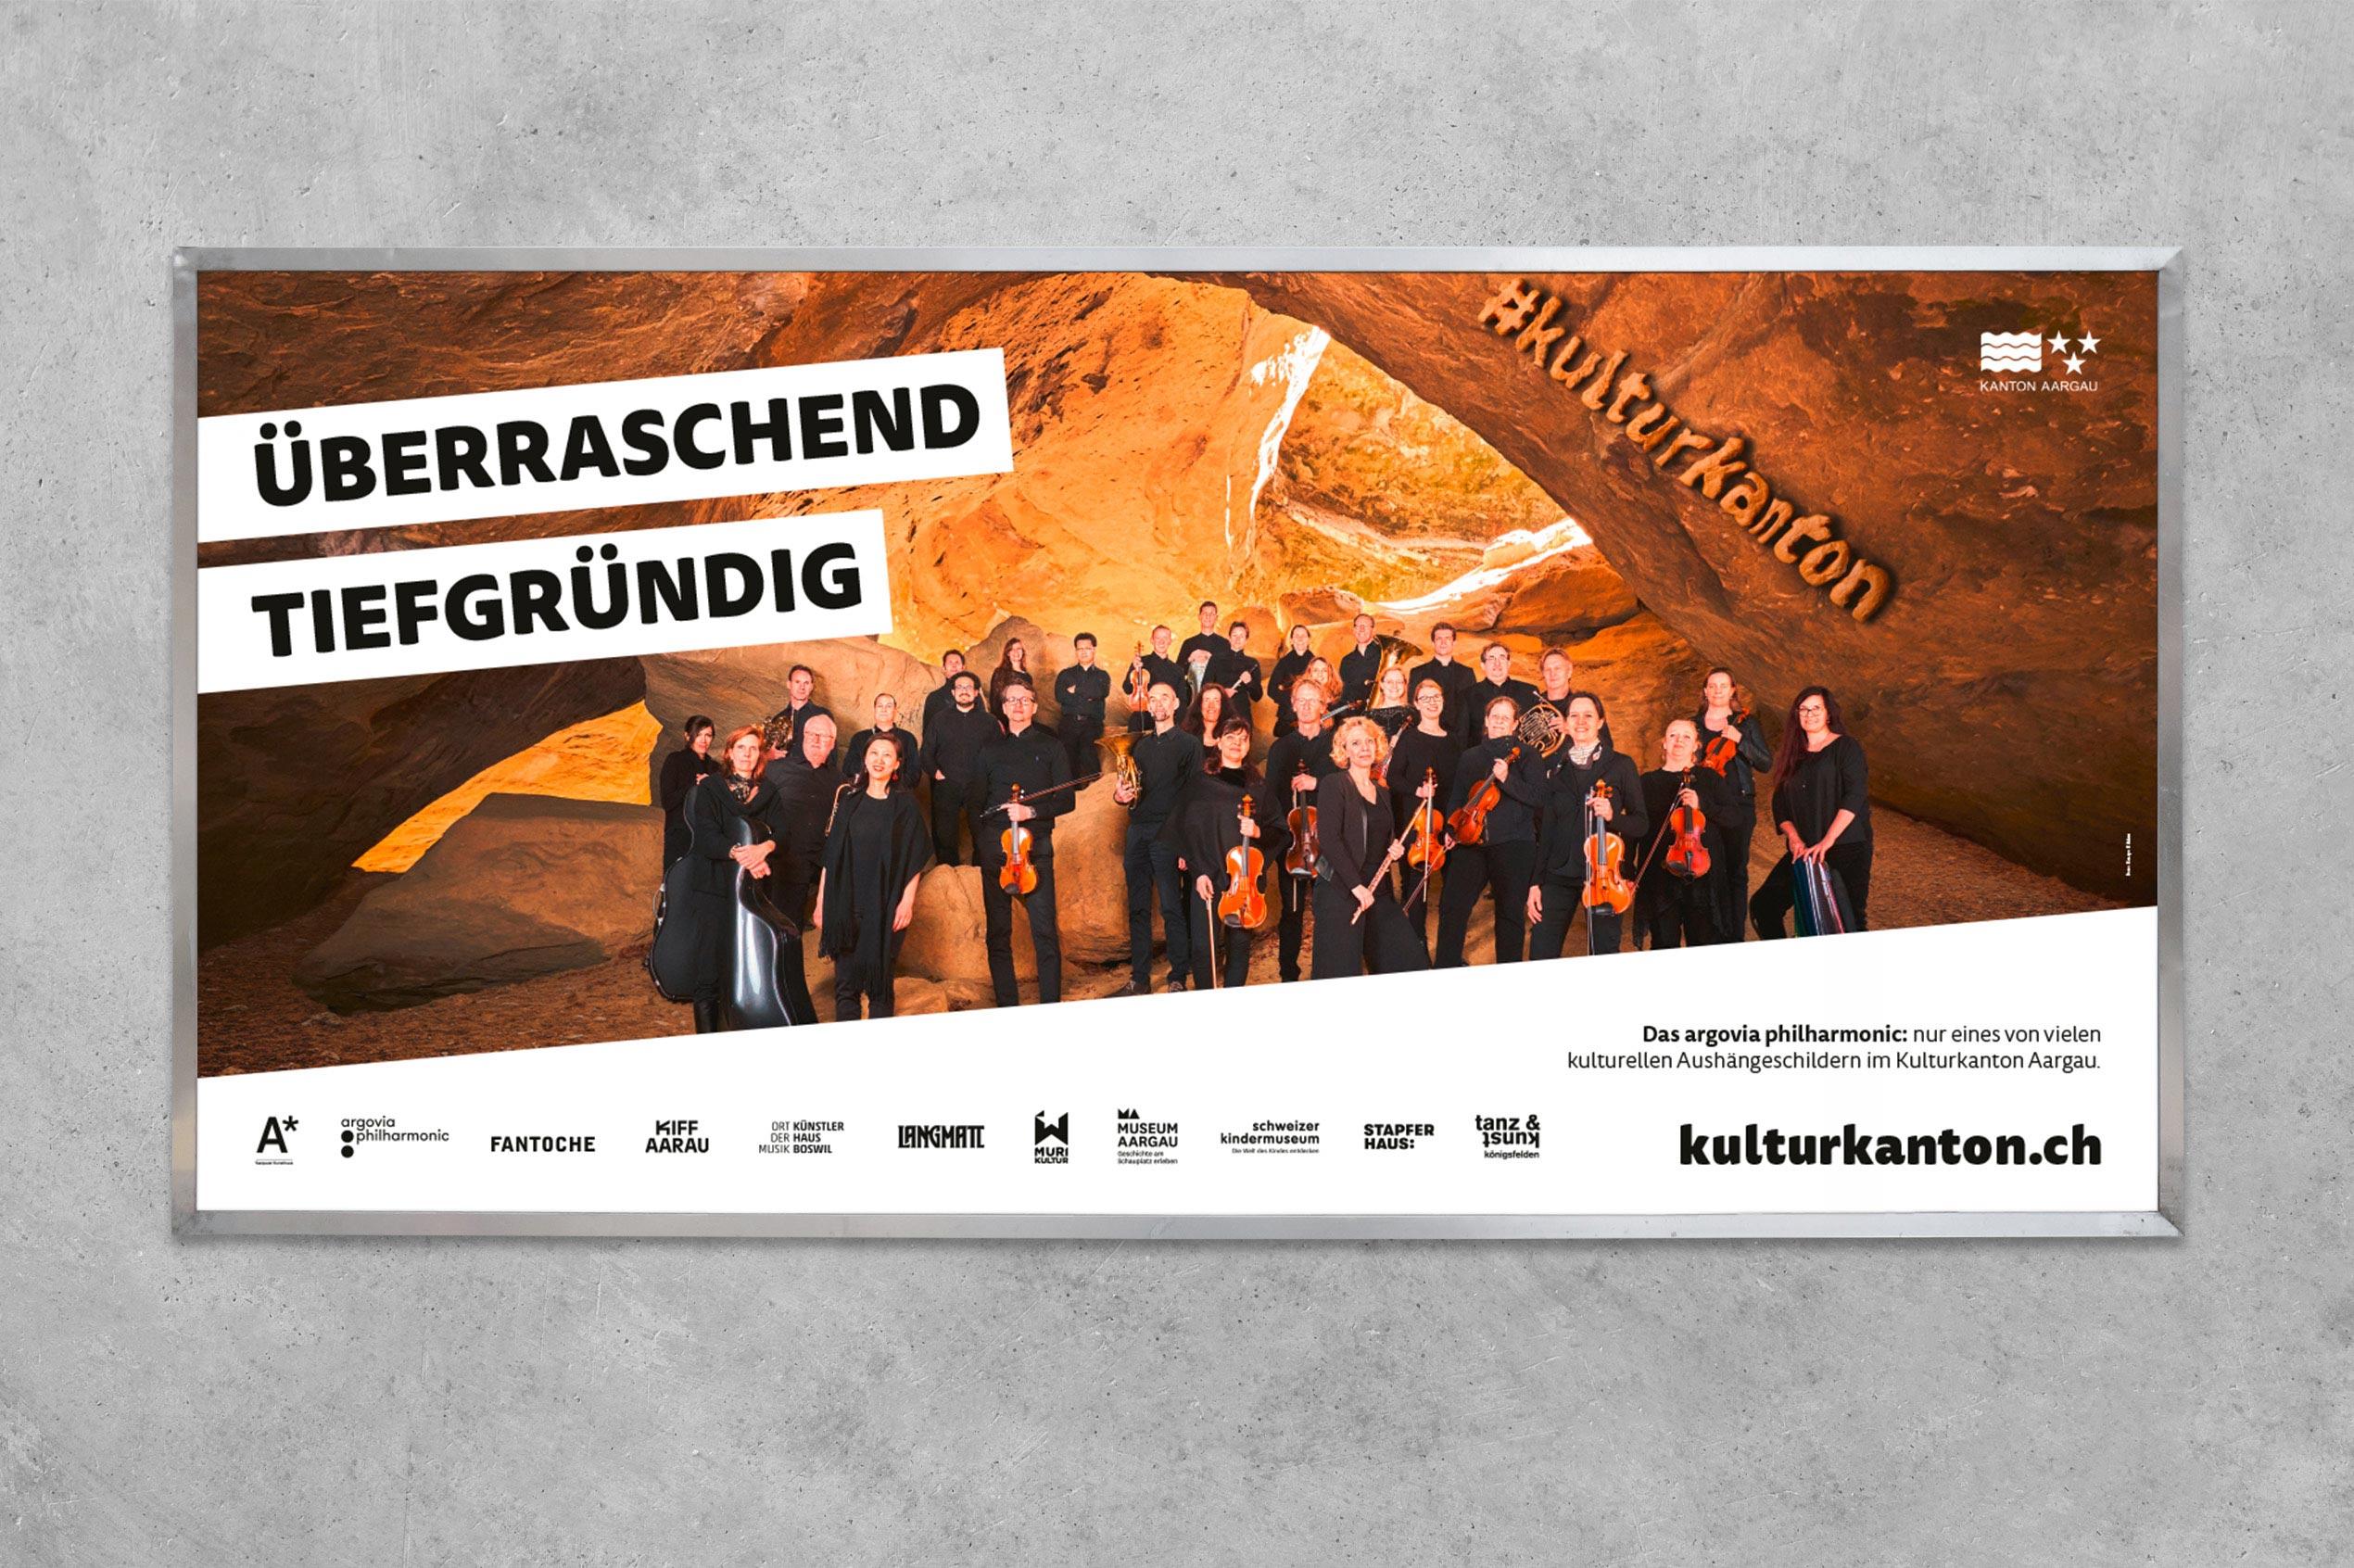 Kulturkanton, Plakat F12, Argovia Philharmonic